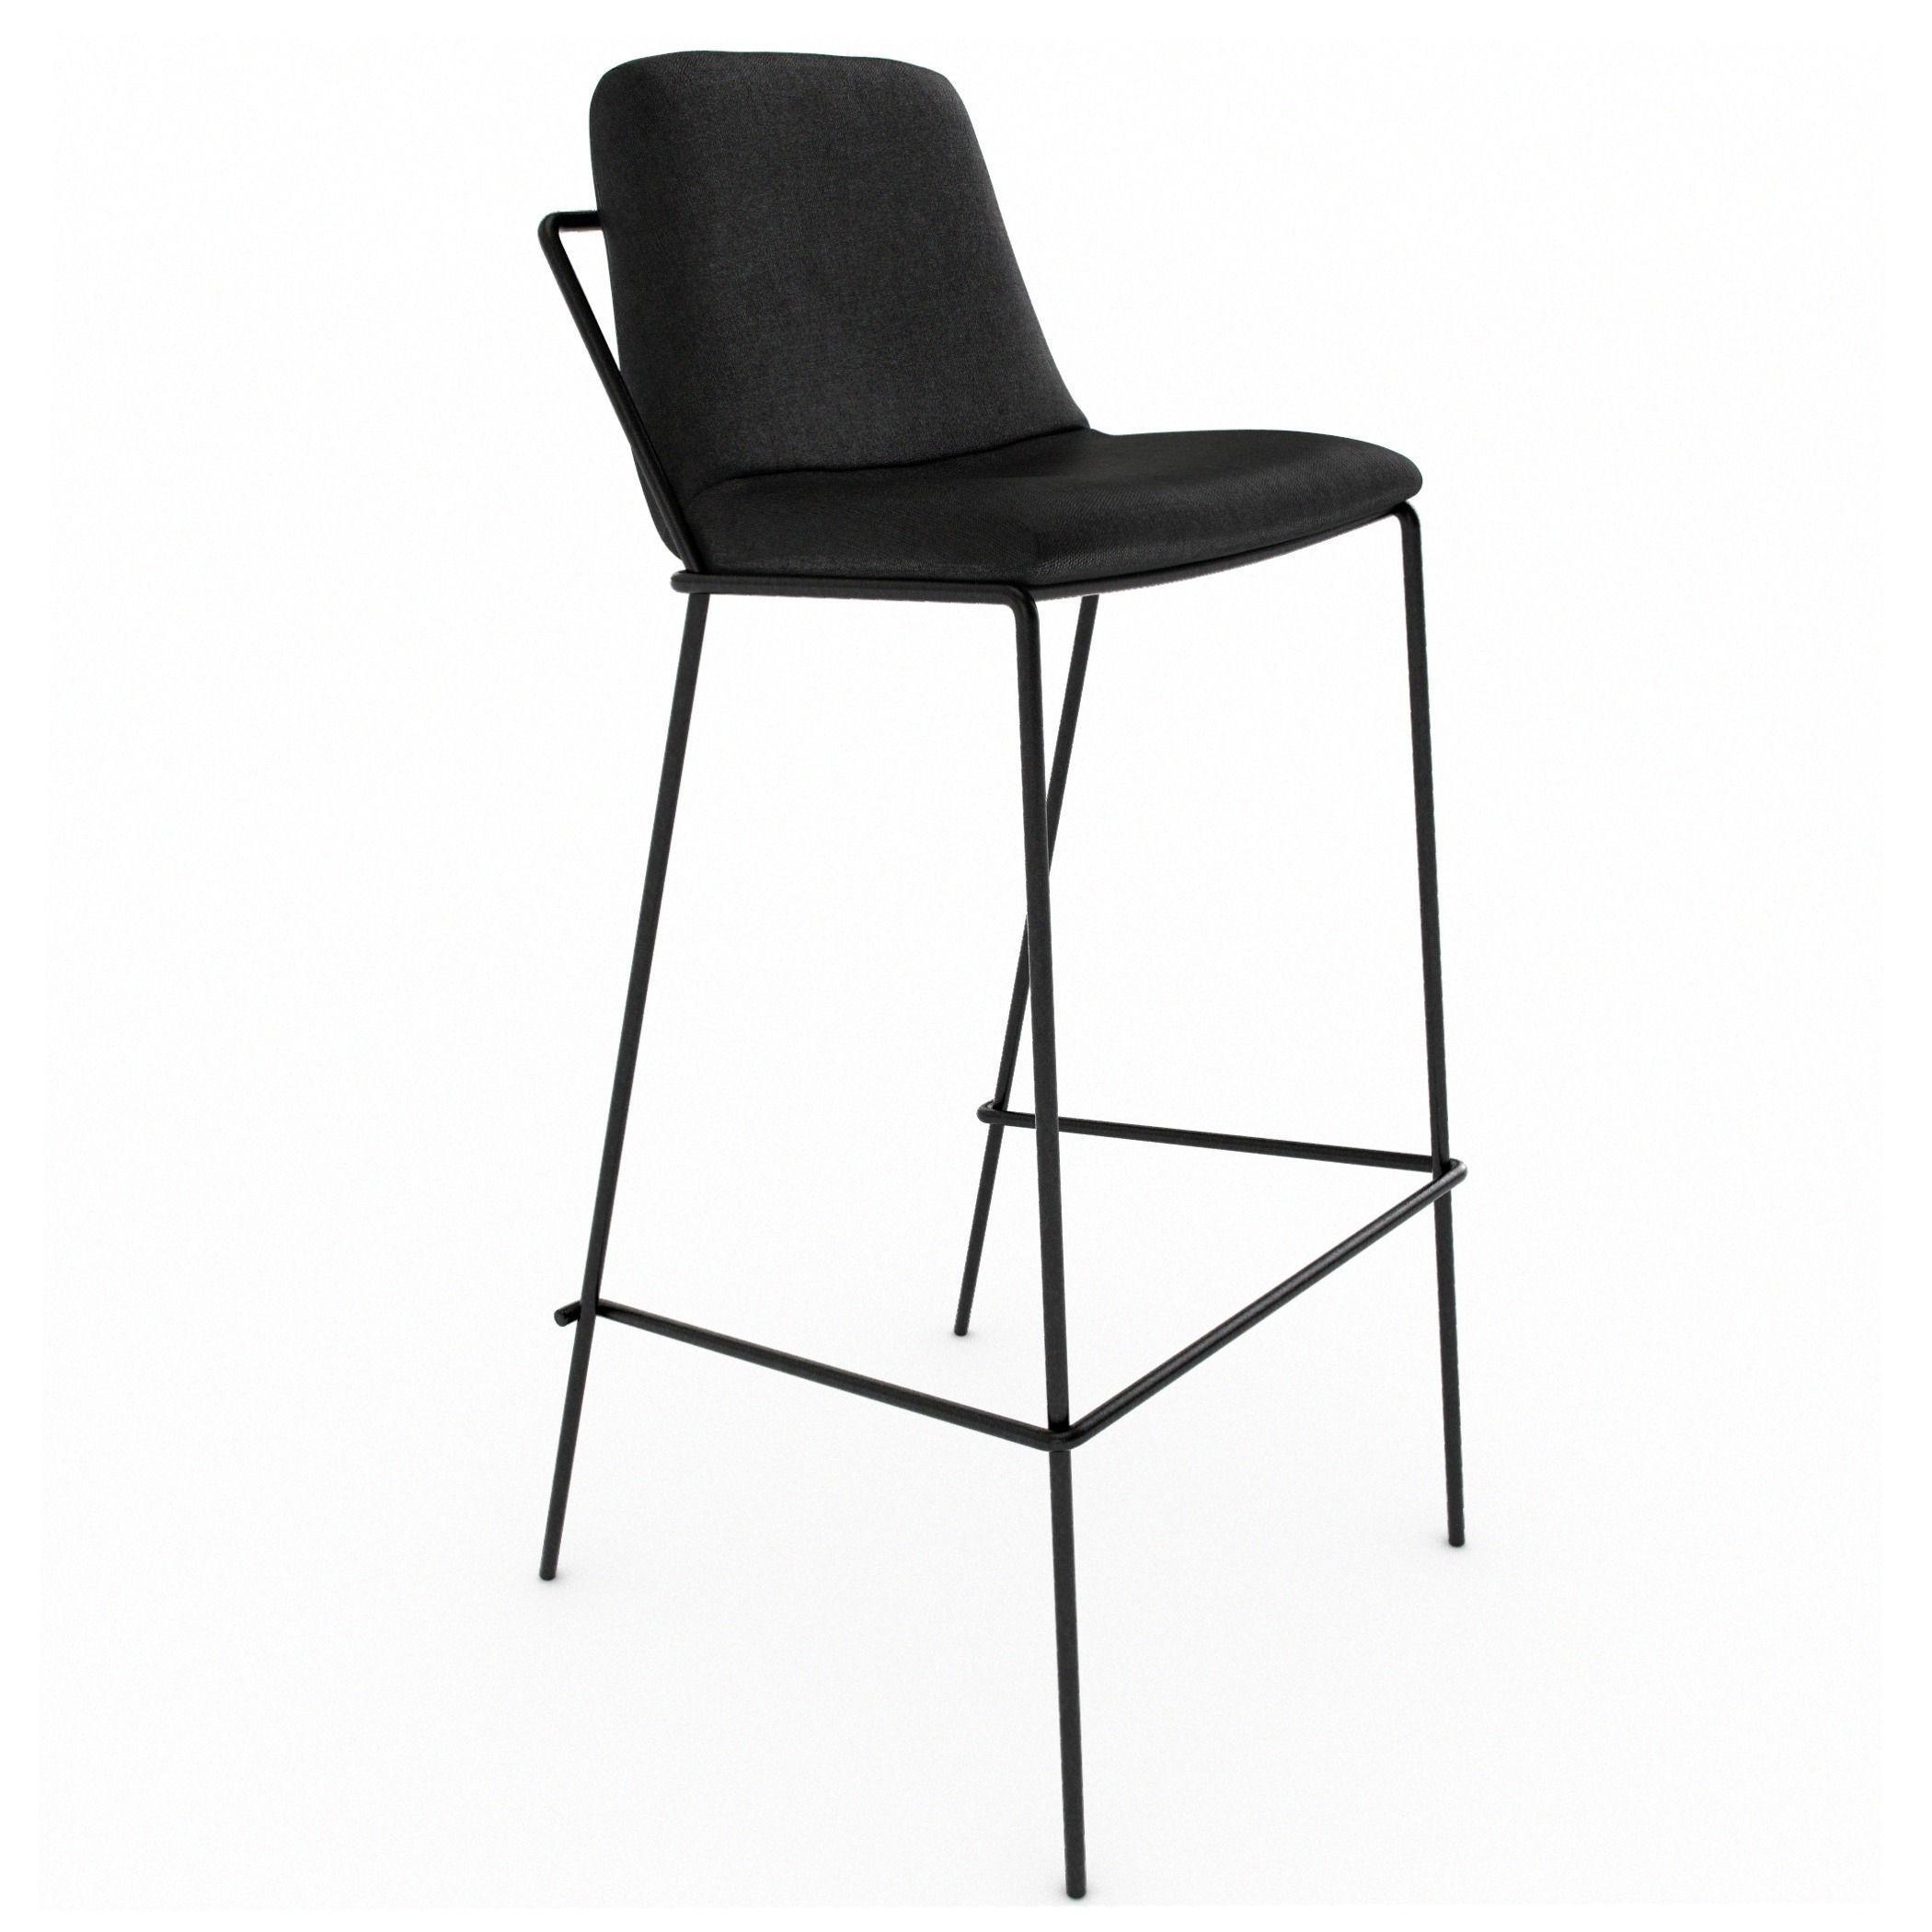 ... Industry West Sling Bar Stool Upholstered 3d Model Max Obj Dxf Ztl Mat  2 ...